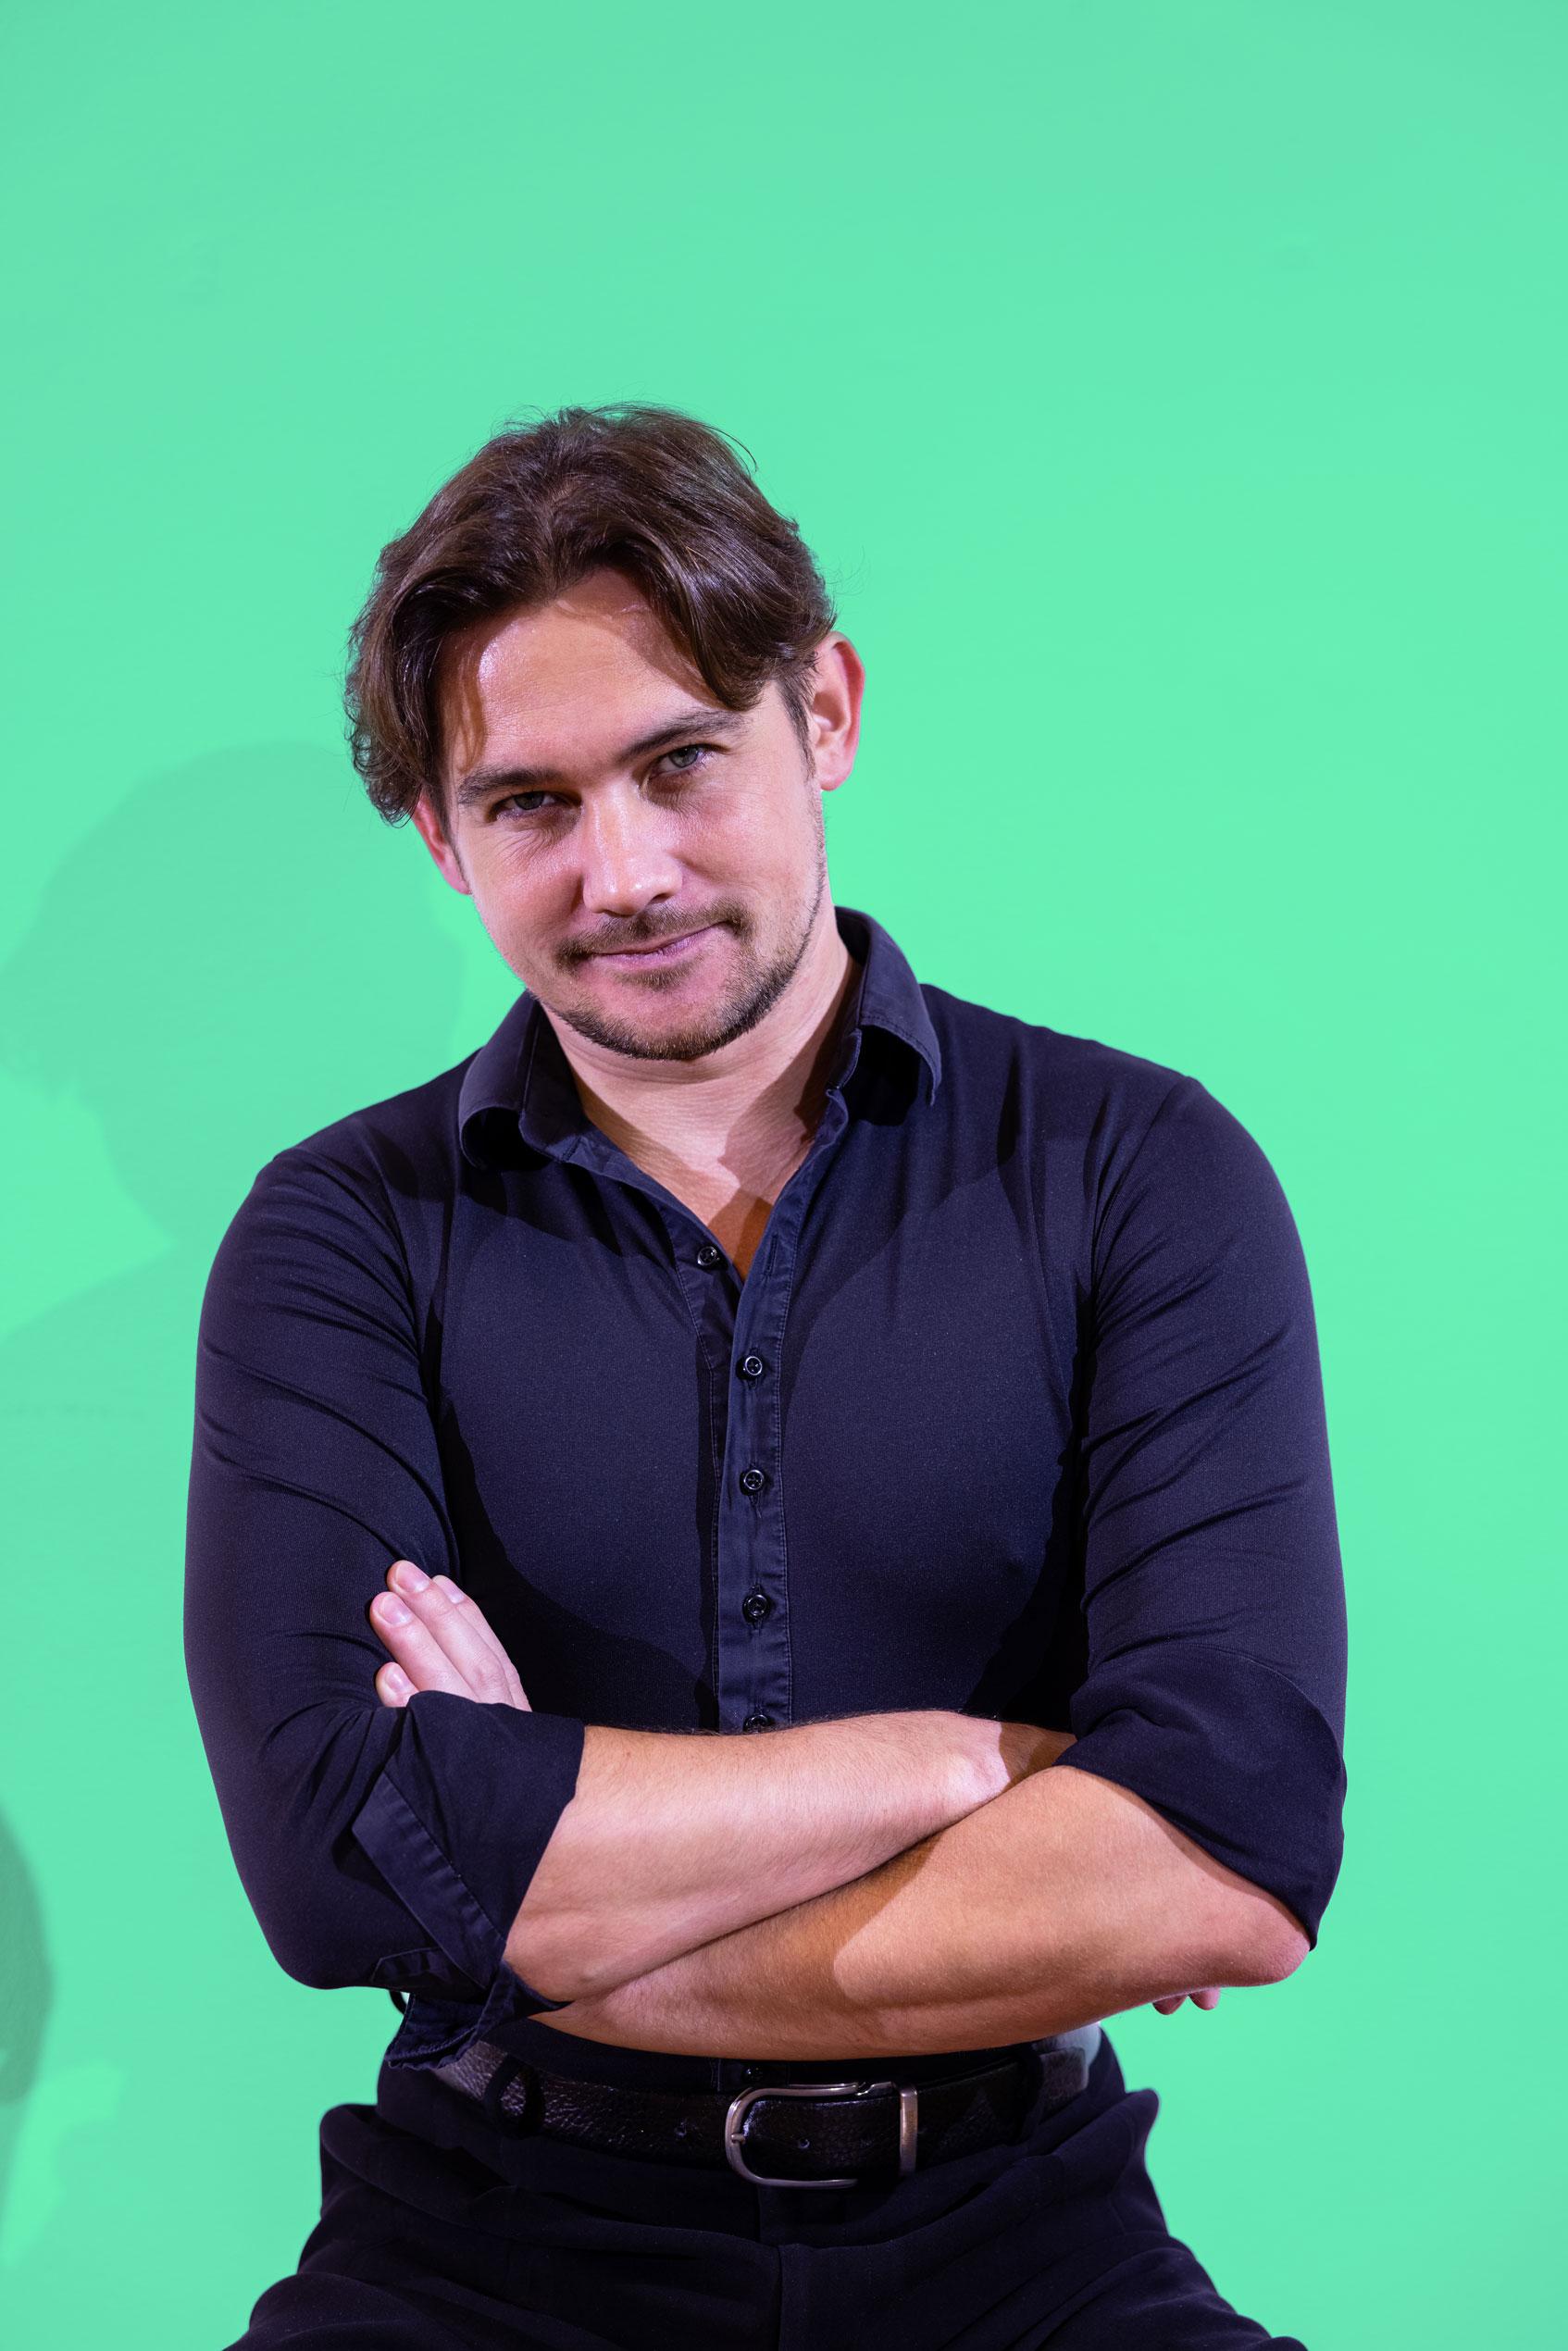 dance instructor profile picture Anton Lenytskyi